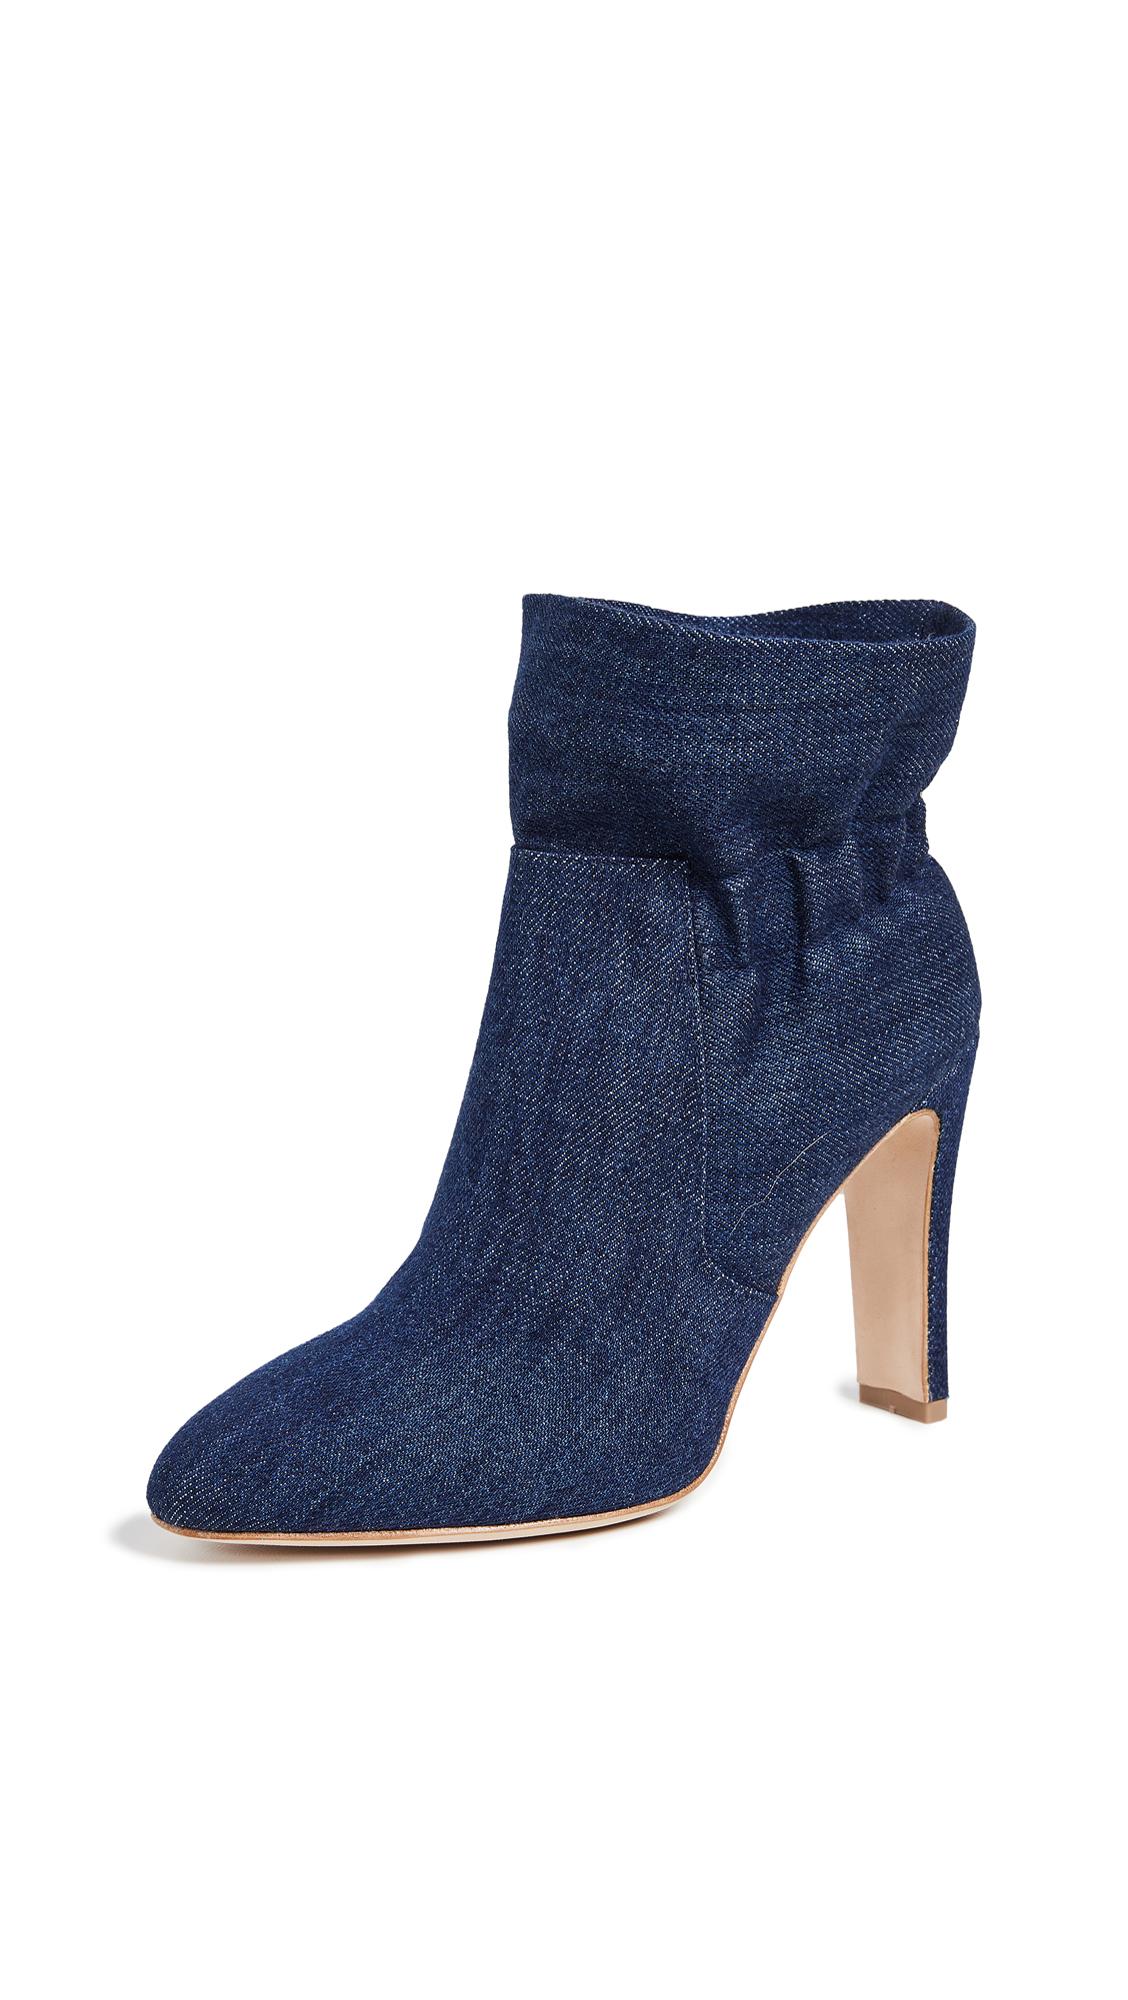 Laurence Dacade Steven Ruffle Boots - Blue